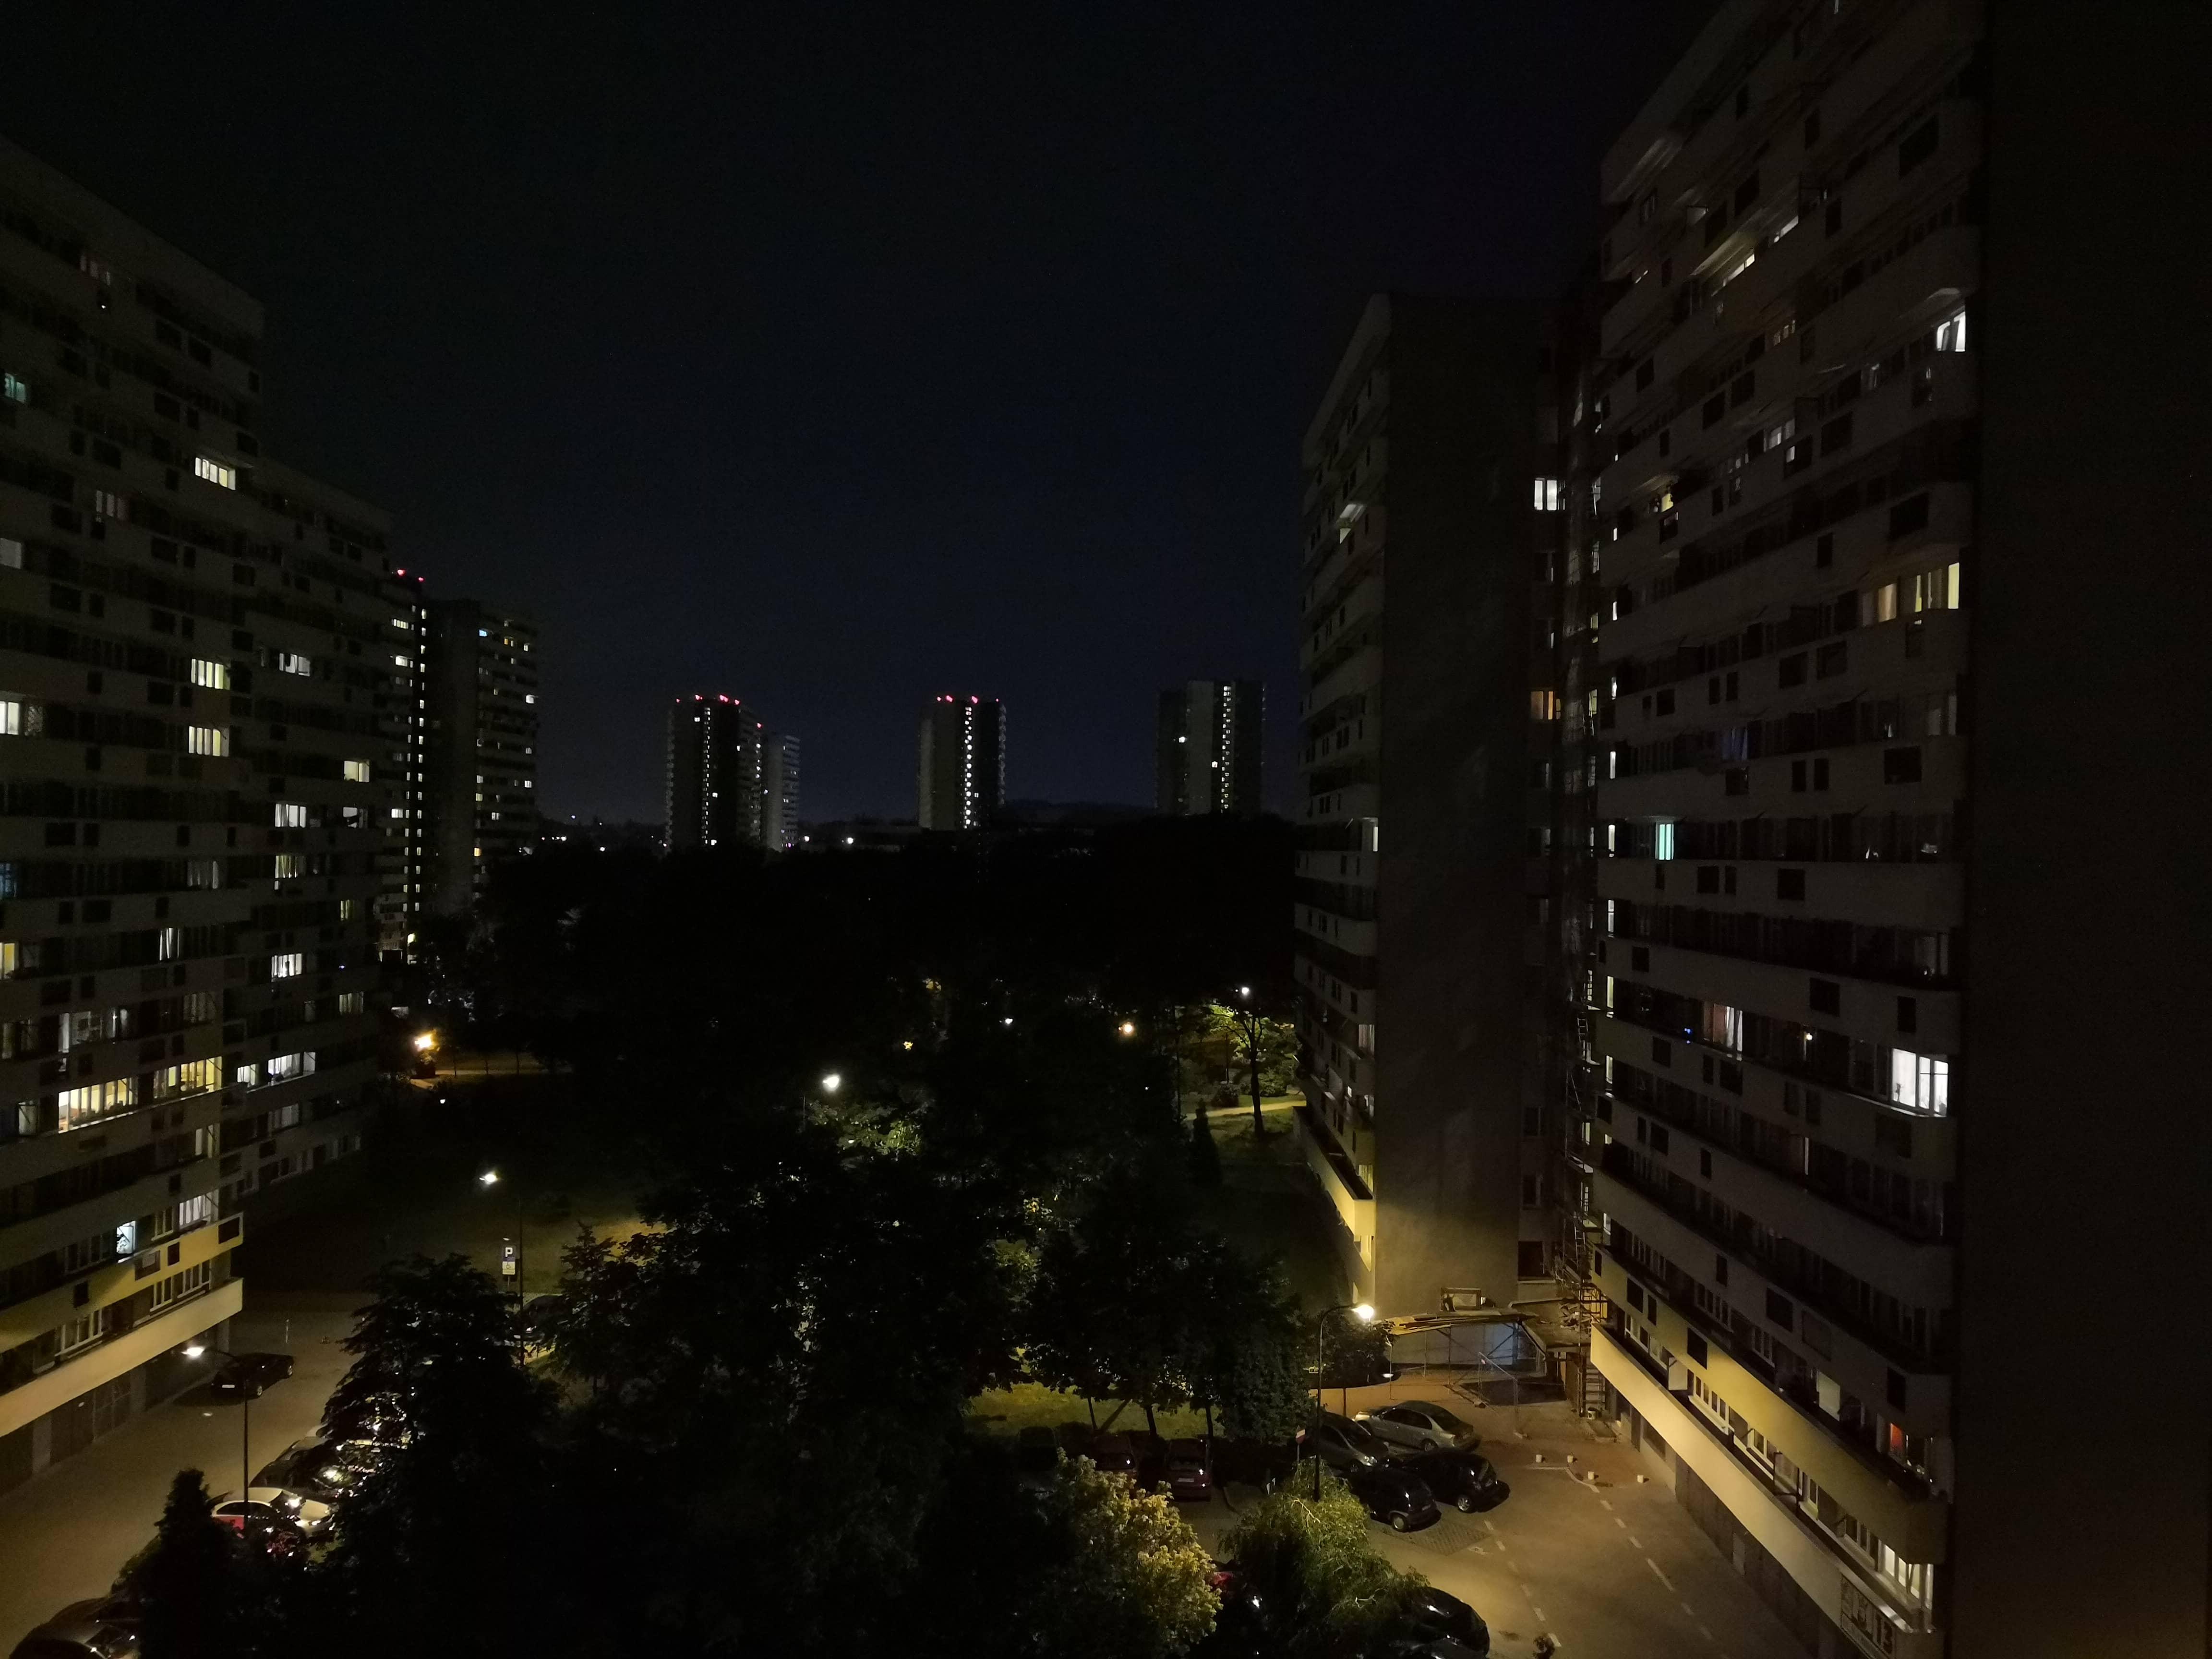 Zdjęcia nocne - Honor View 10